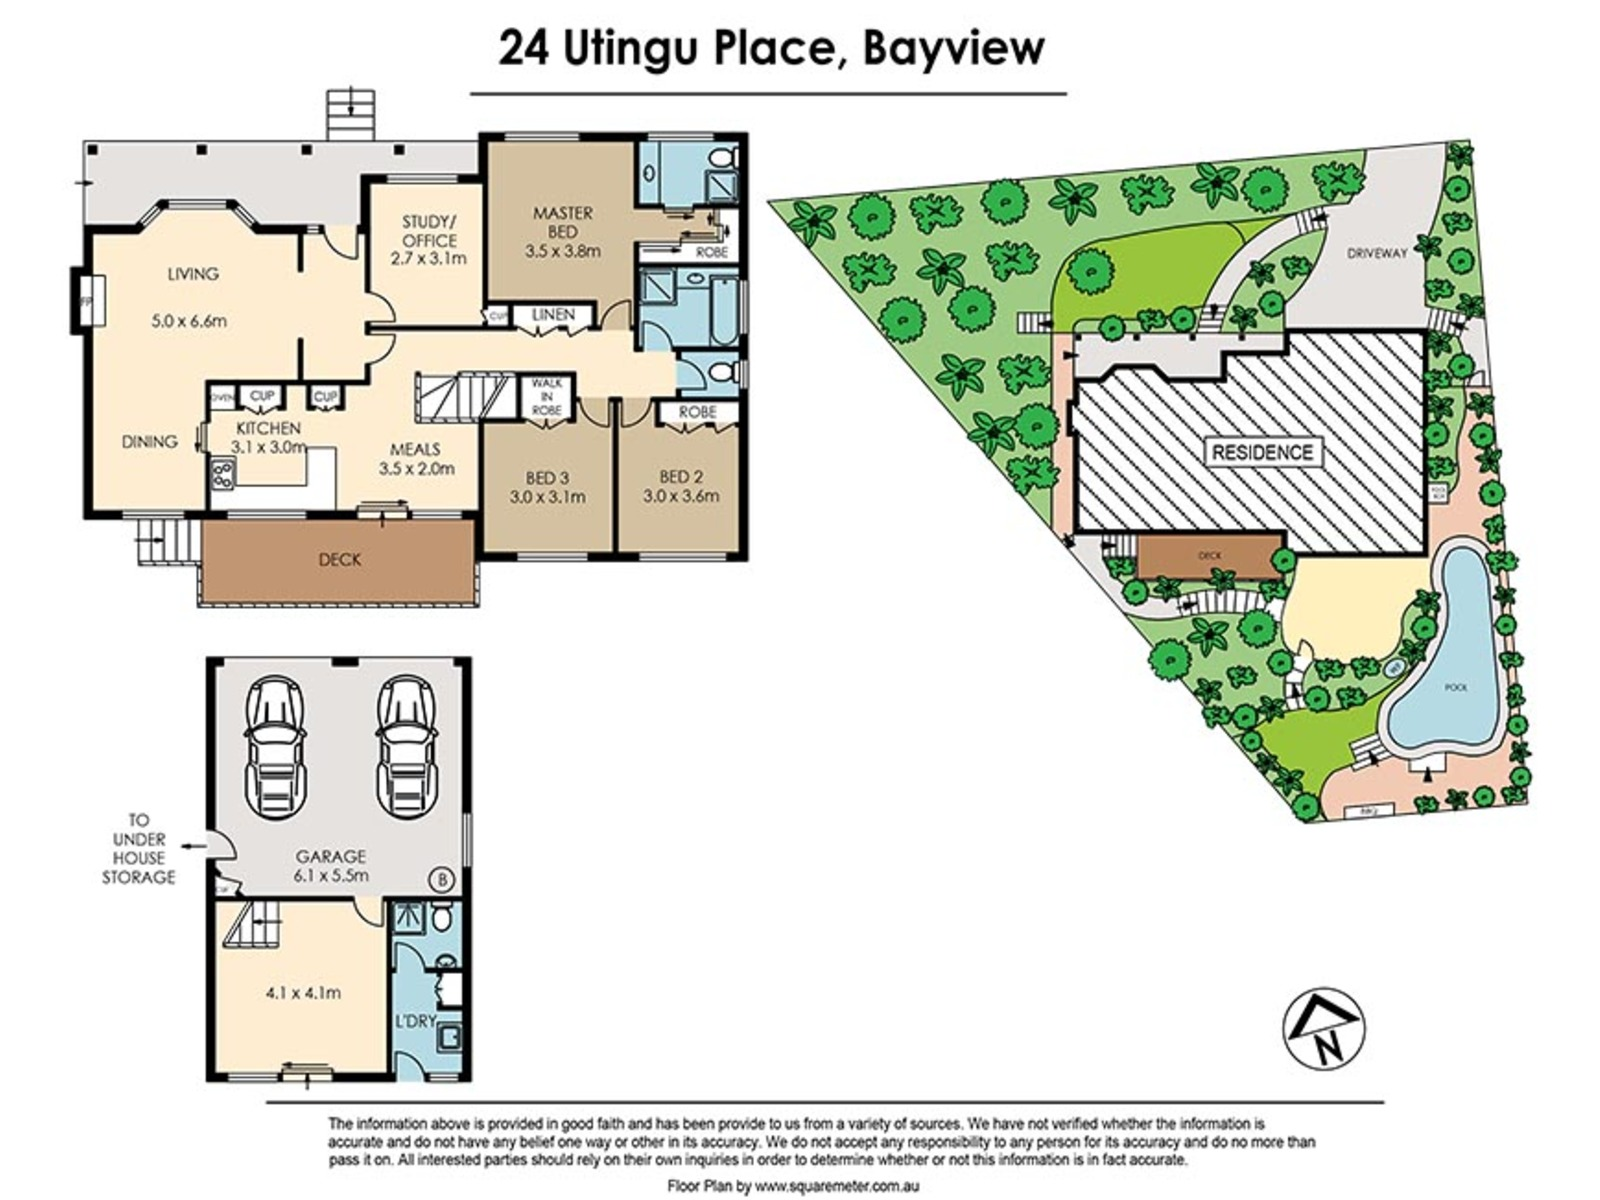 24 Utingu Place, Bayview